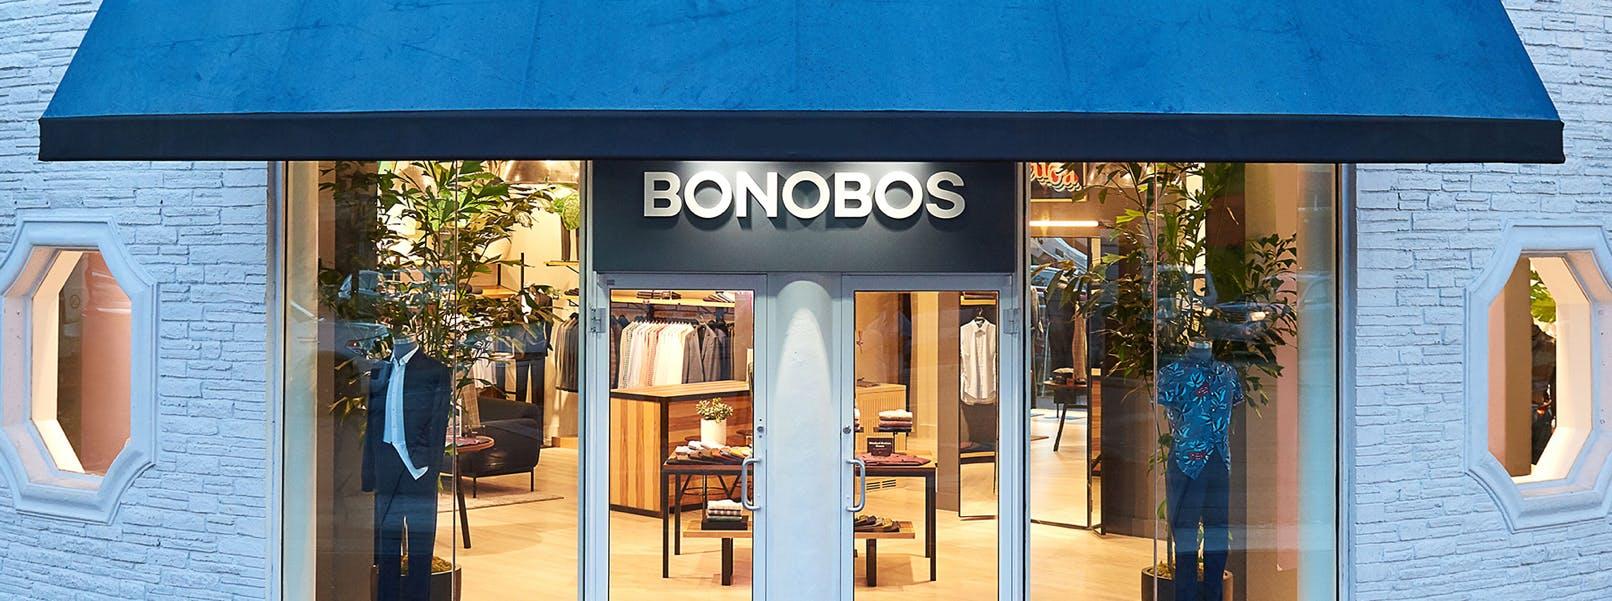 Entrance of Bonobos guideshop